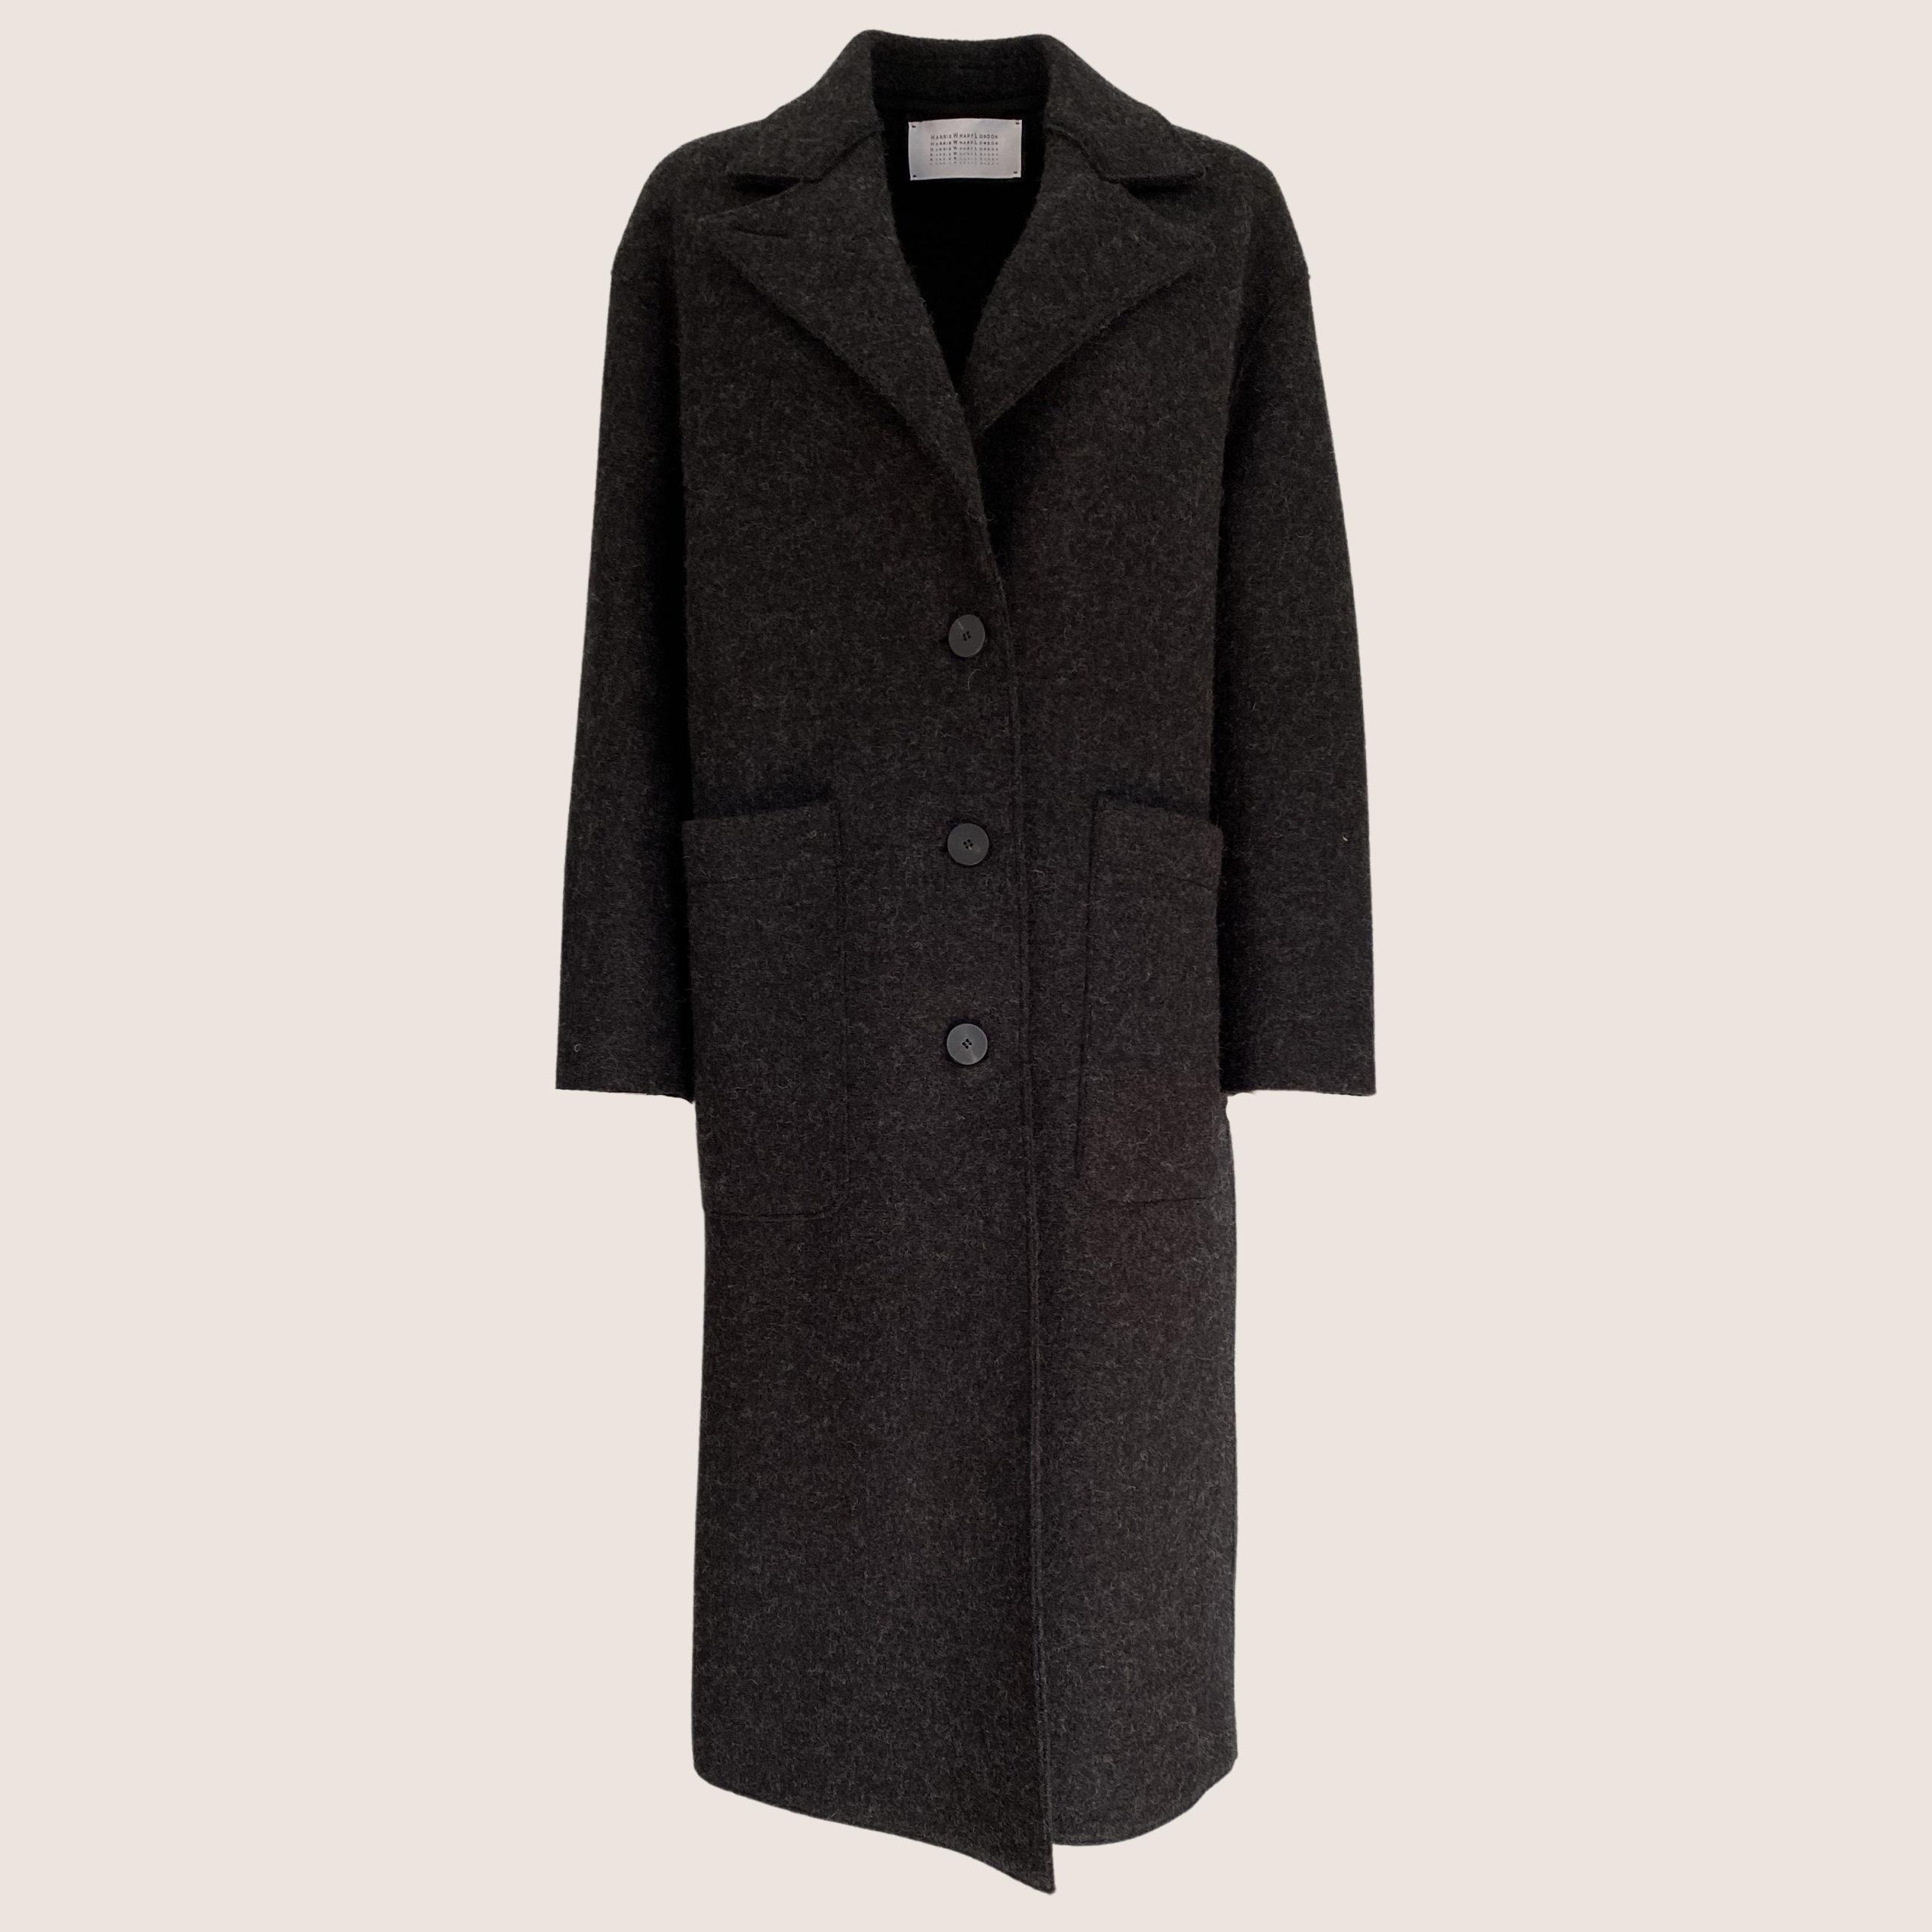 Boiled Wool Great Coat